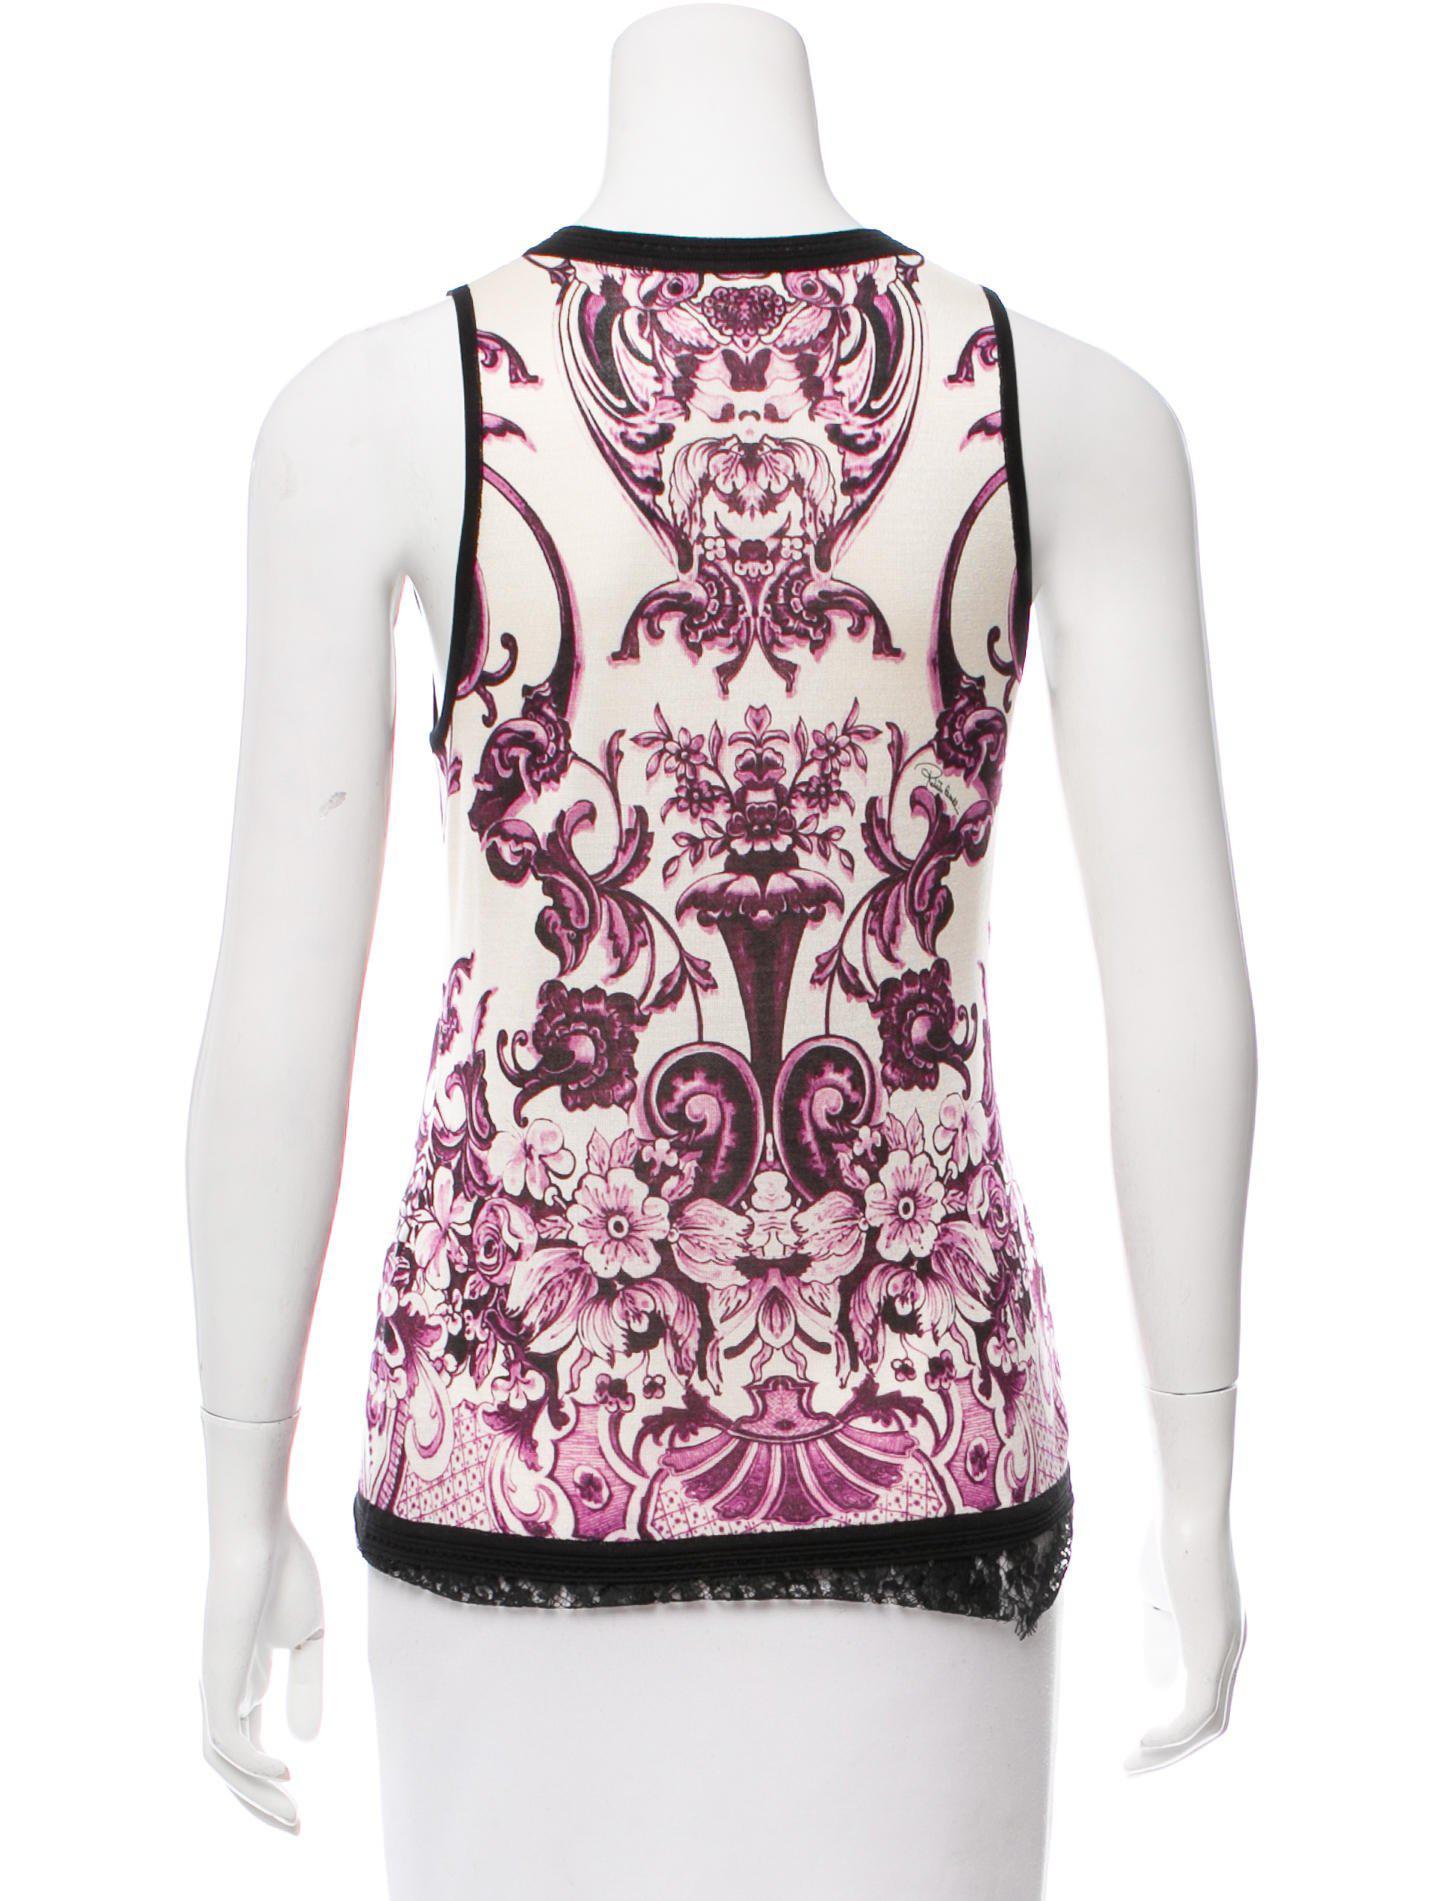 489480fbec0fa5 Lyst - Roberto Cavalli Lace-trimmed Silk Top in Purple